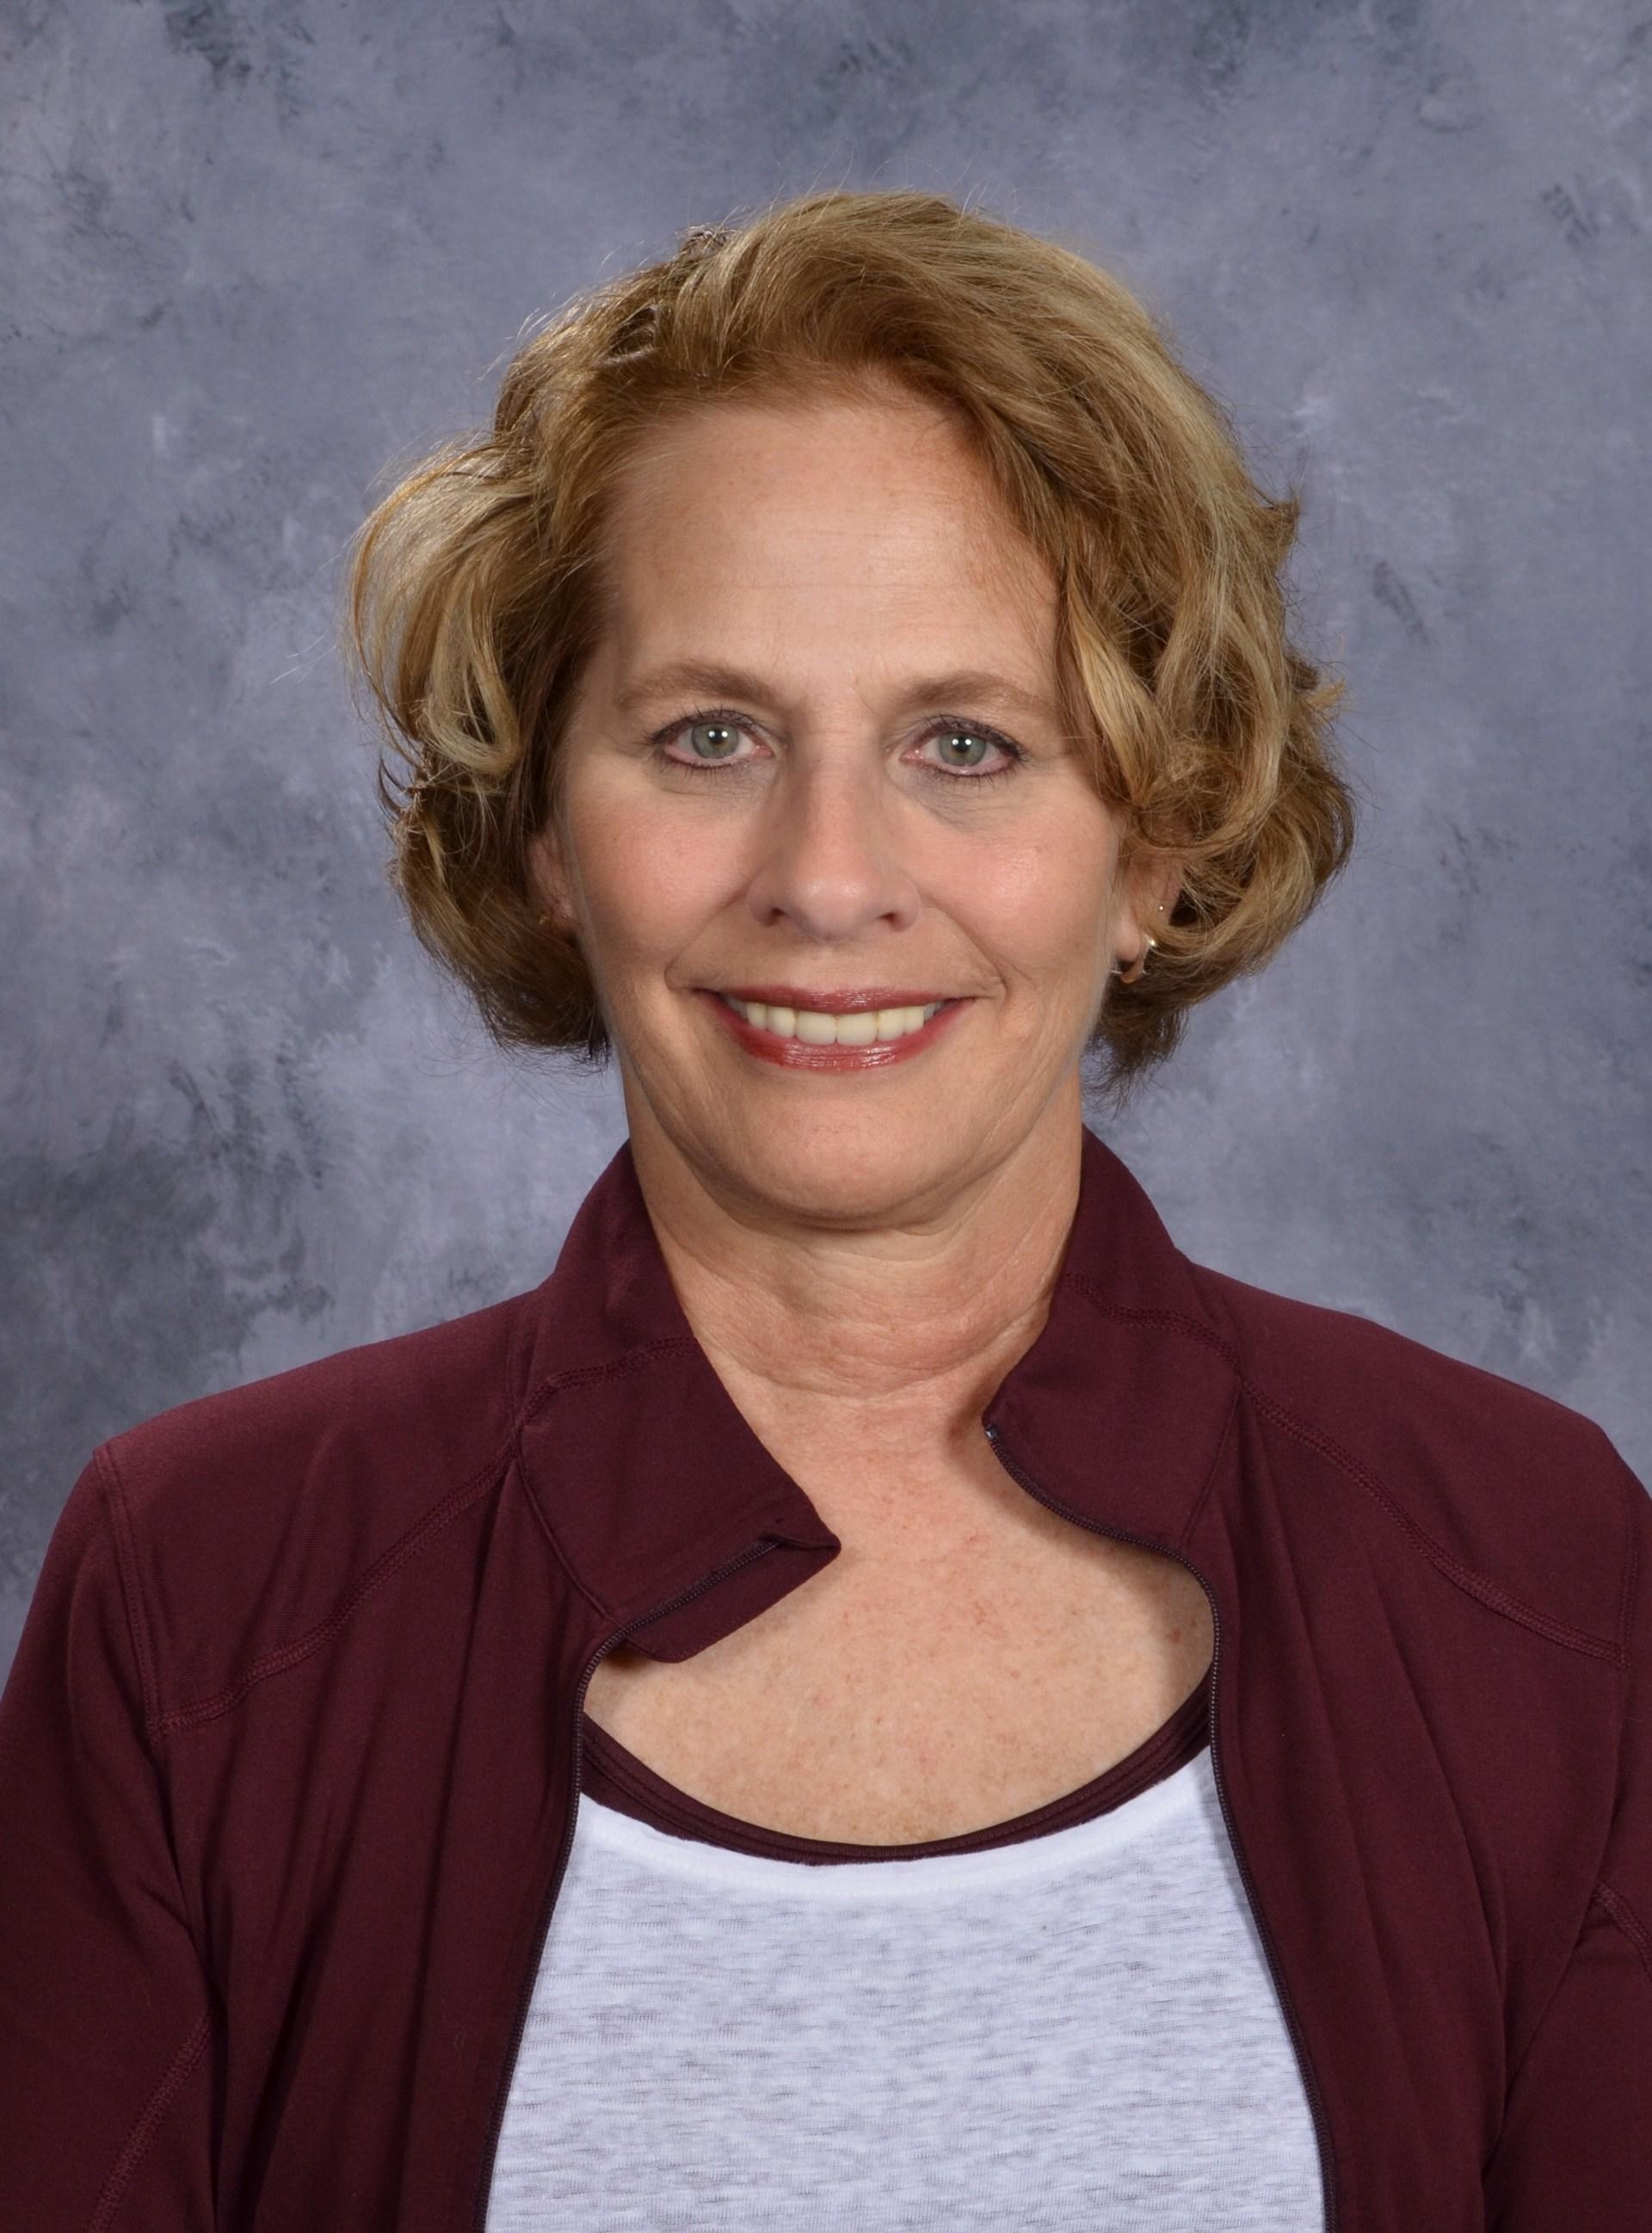 woman with short blondish hair wearing burgundy shirt